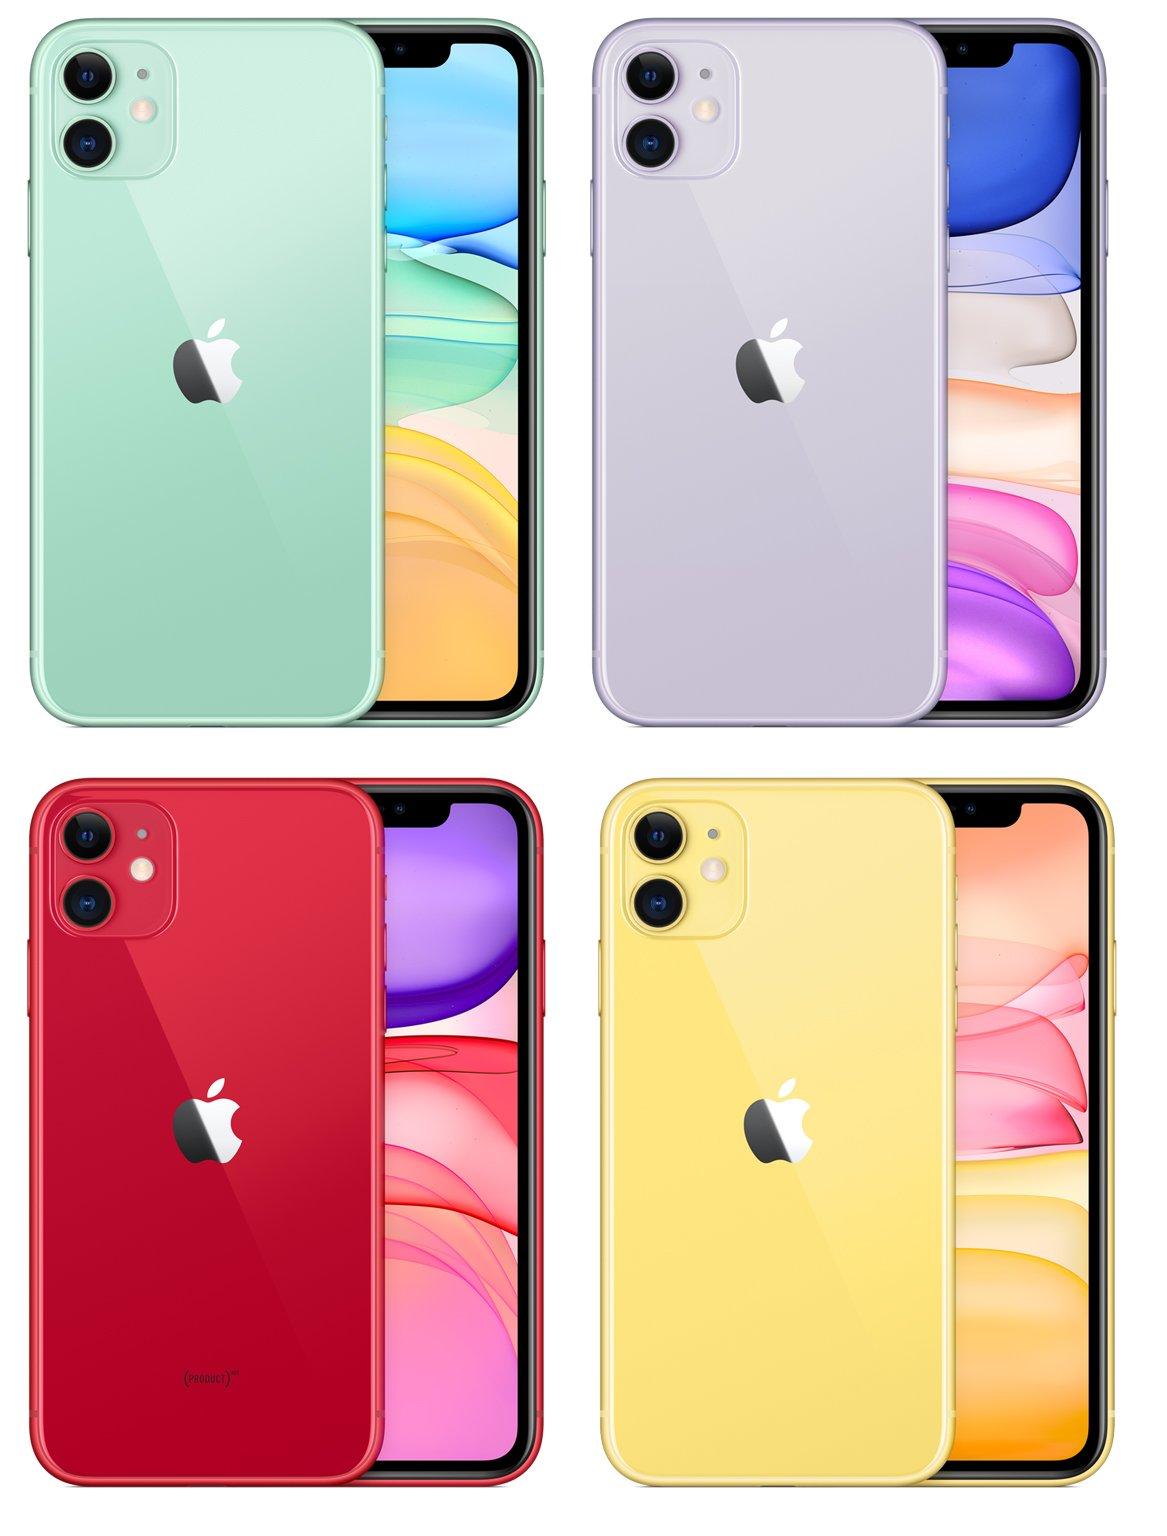 Apple iPhone 11 характеристики, обзор, отзывы, дата выхода - PhonesData